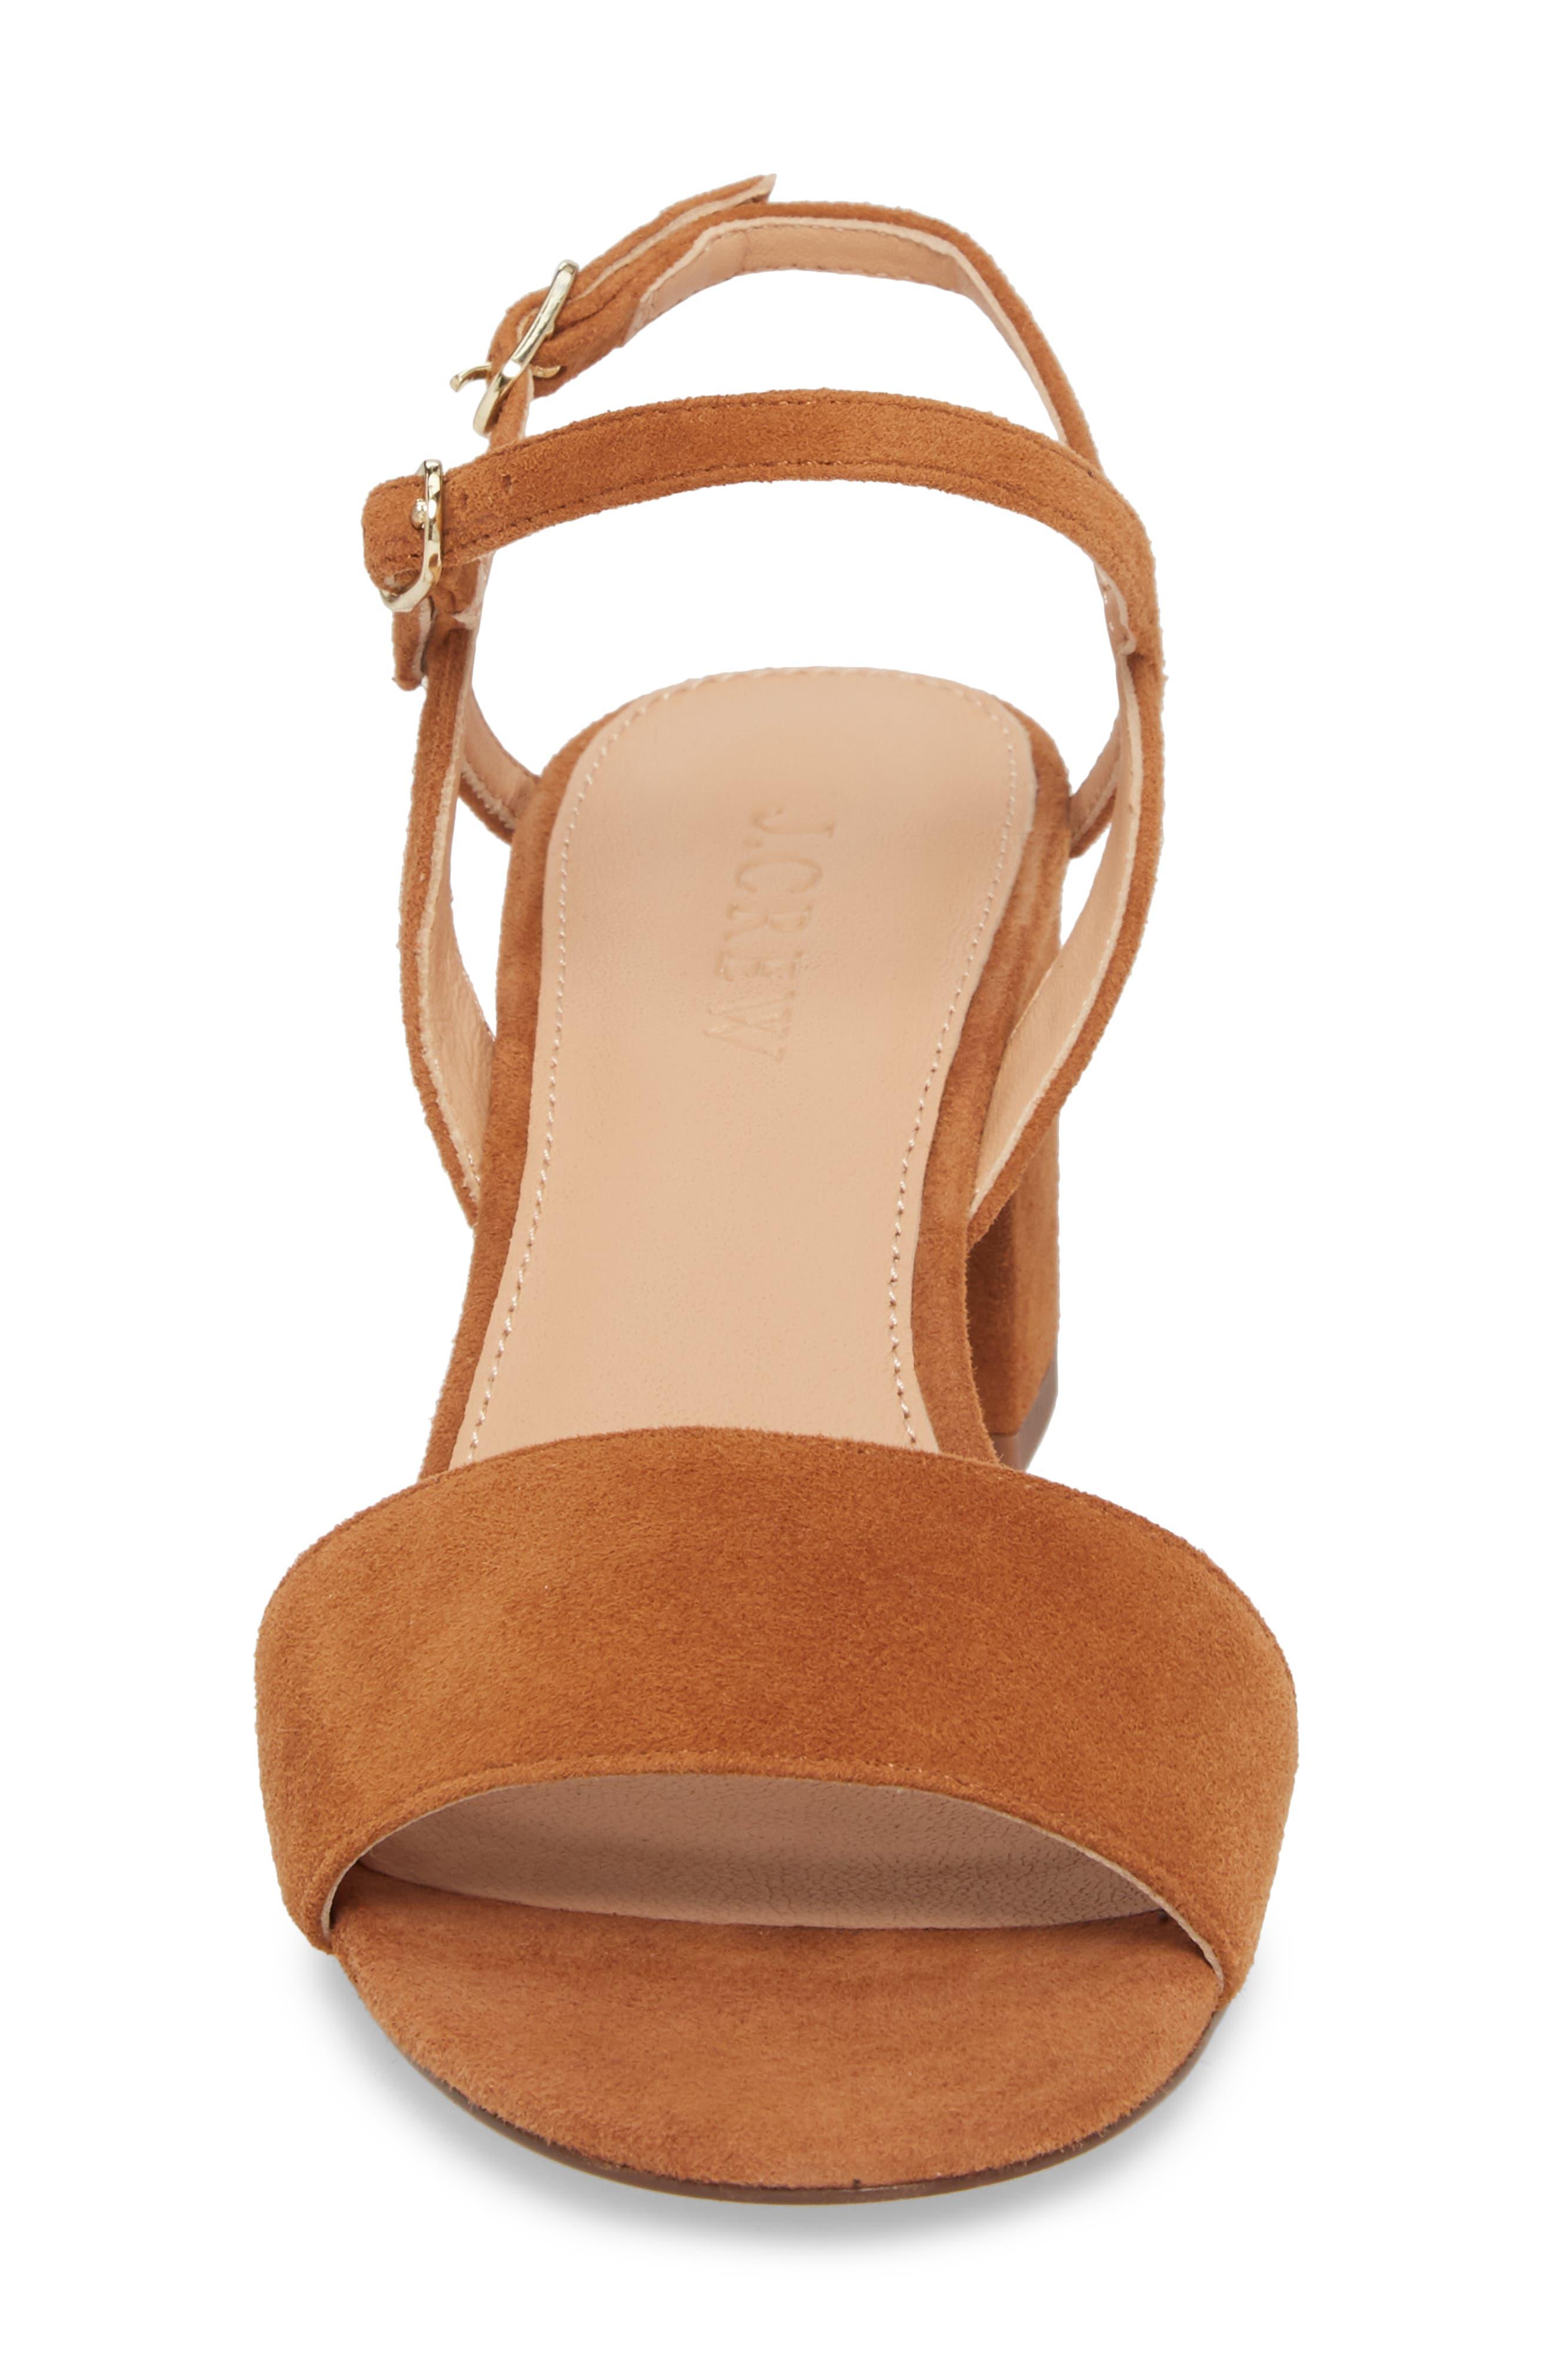 Strappy Block Heel Sandal,                             Alternate thumbnail 10, color,